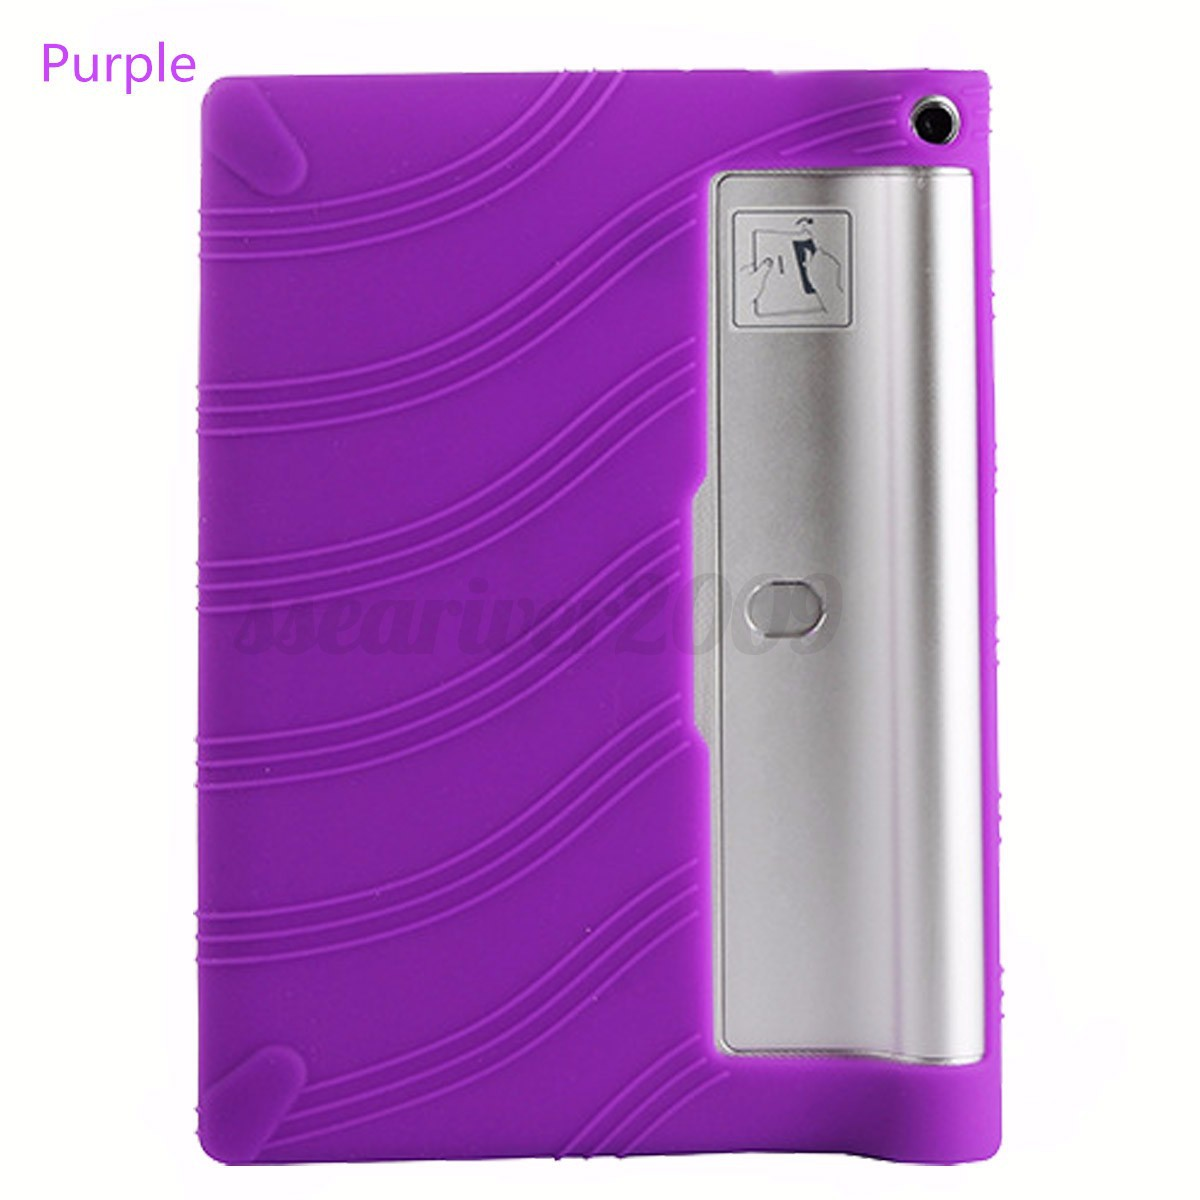 Tpu silicone gel rubber case cover for 10 1 39 39 inch lenovo - Funda protectora tablet ...